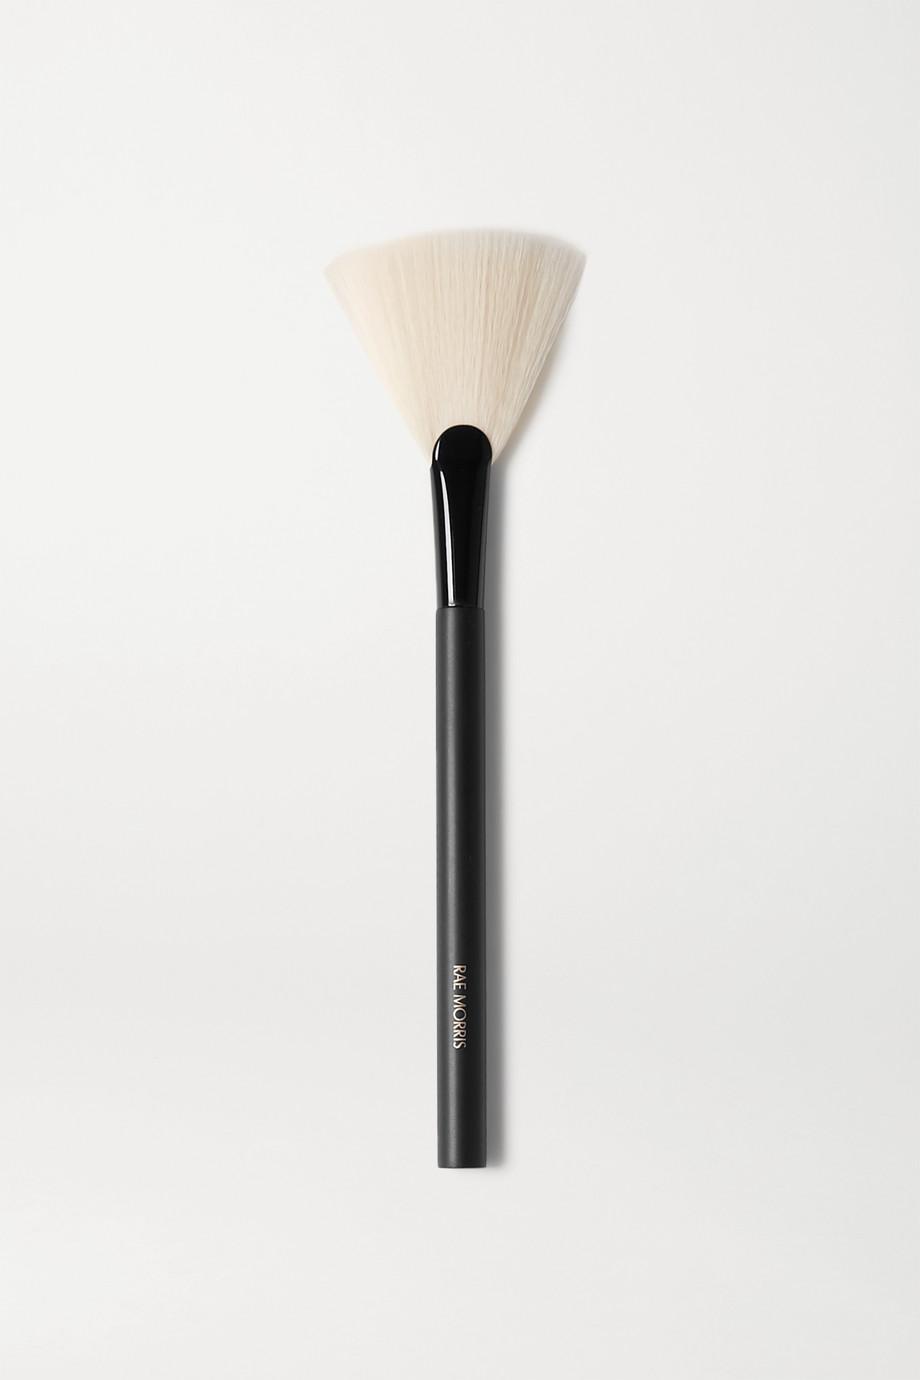 Rae Morris Jishaku 25 Fan Highlighter Brush – Highlighter-Pinsel